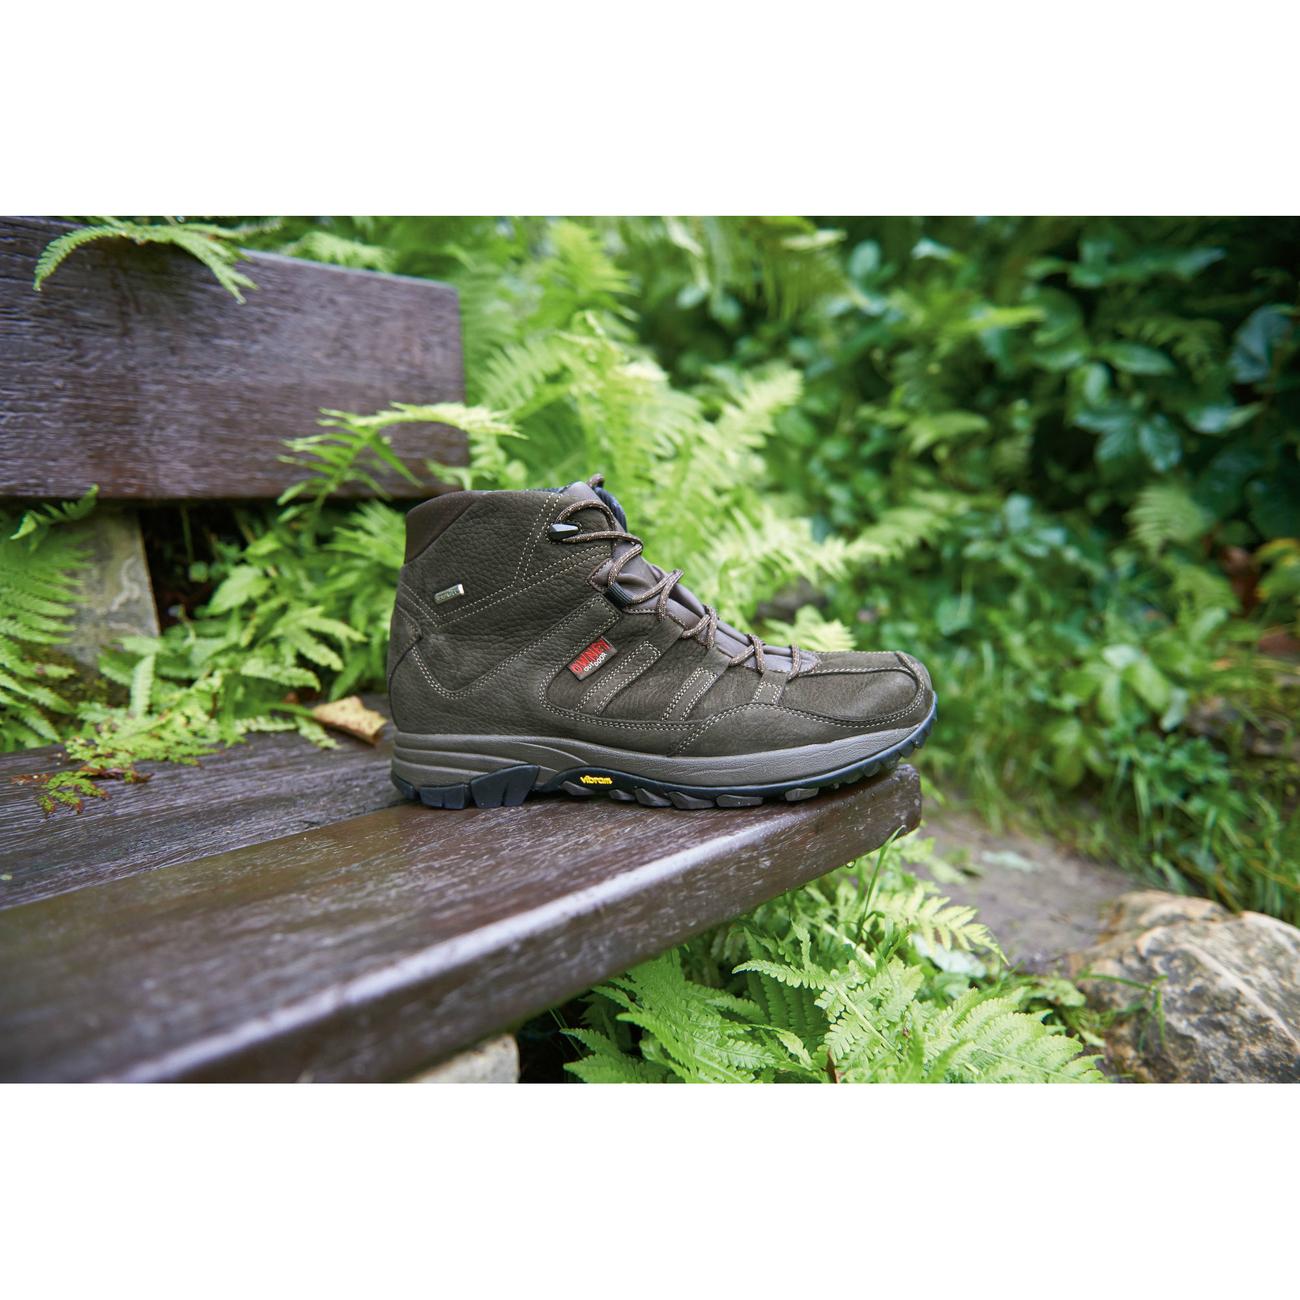 Owney Grassland Outdoor Schuhe, Bild 4